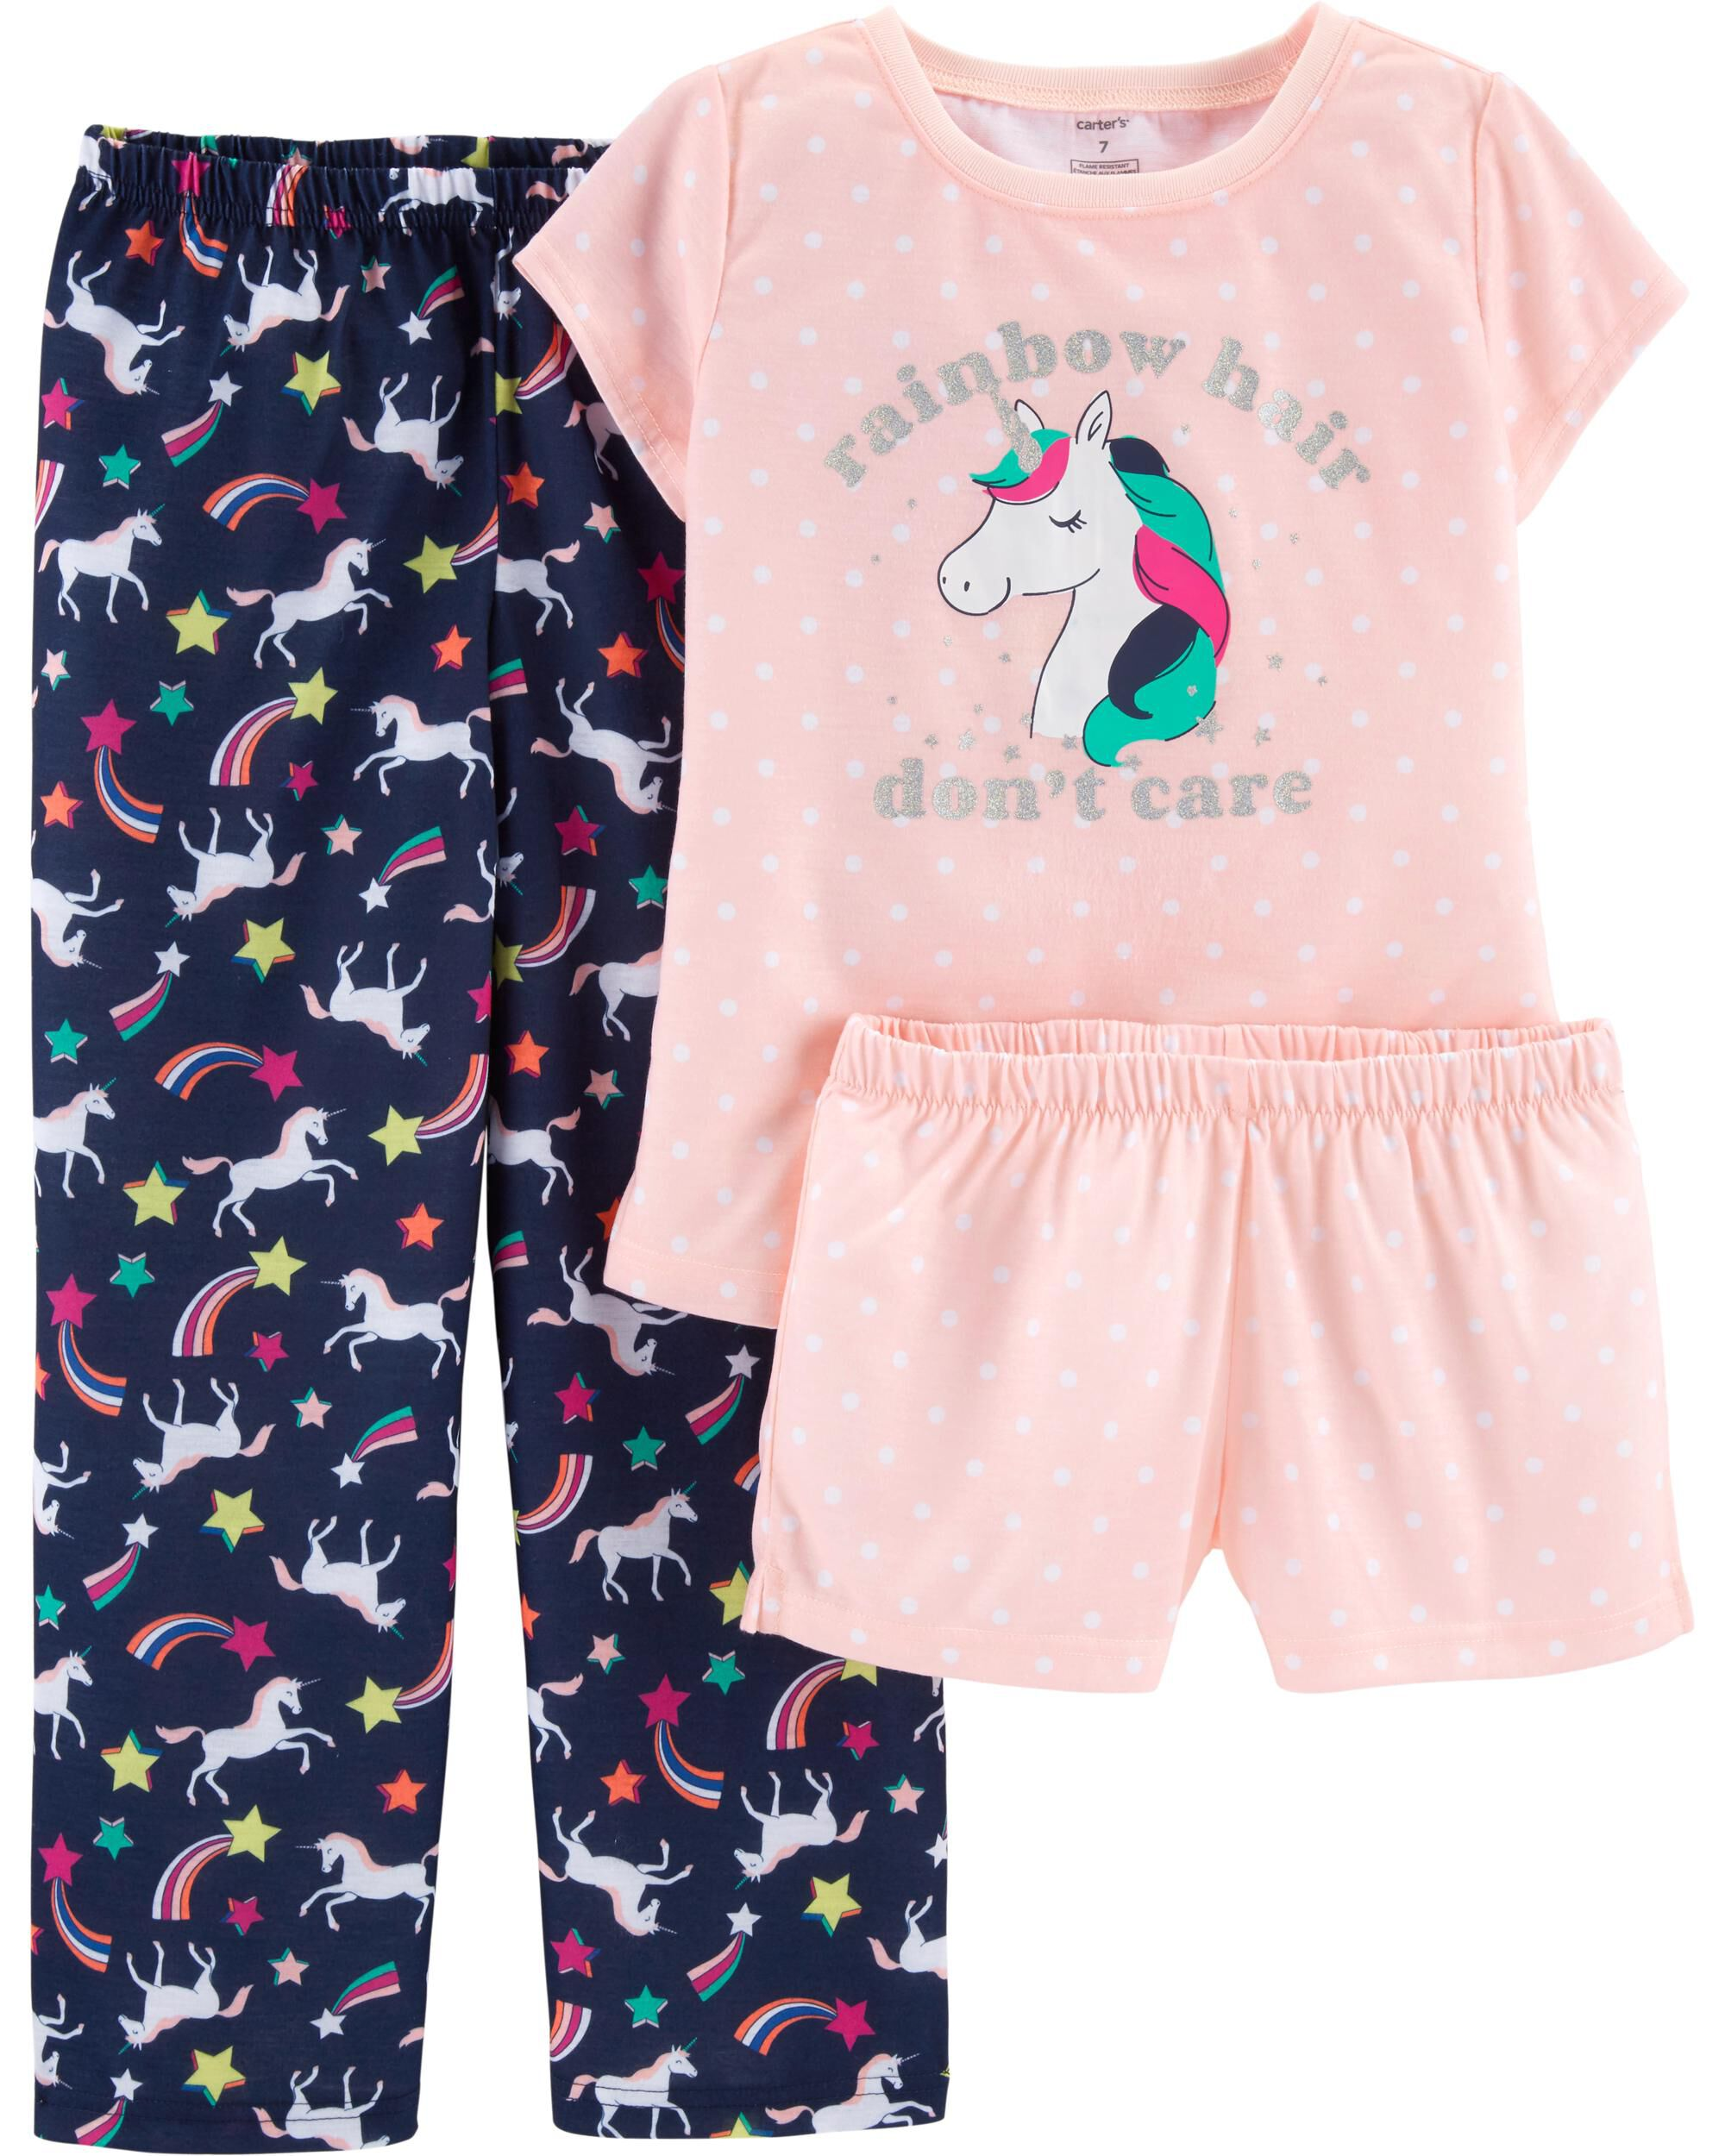 Girls' Clothing (newborn-5t) Carte's Girls Pajamas Mermaid Size 24 Months Online Discount